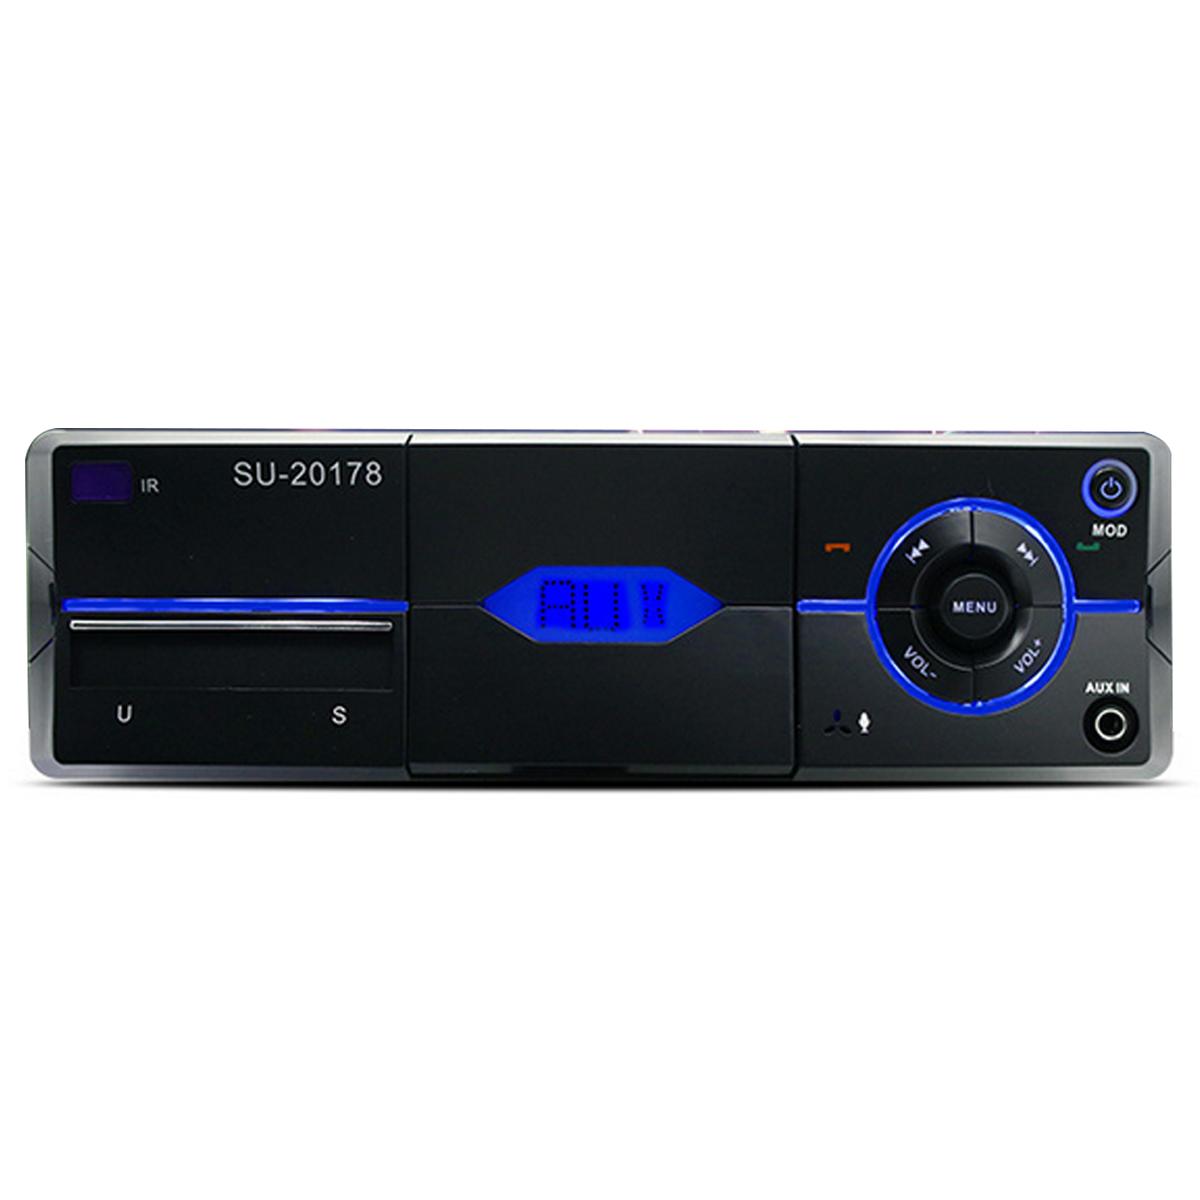 bluetooth car stereo fm radio sd usb aux rc mp3 player. Black Bedroom Furniture Sets. Home Design Ideas